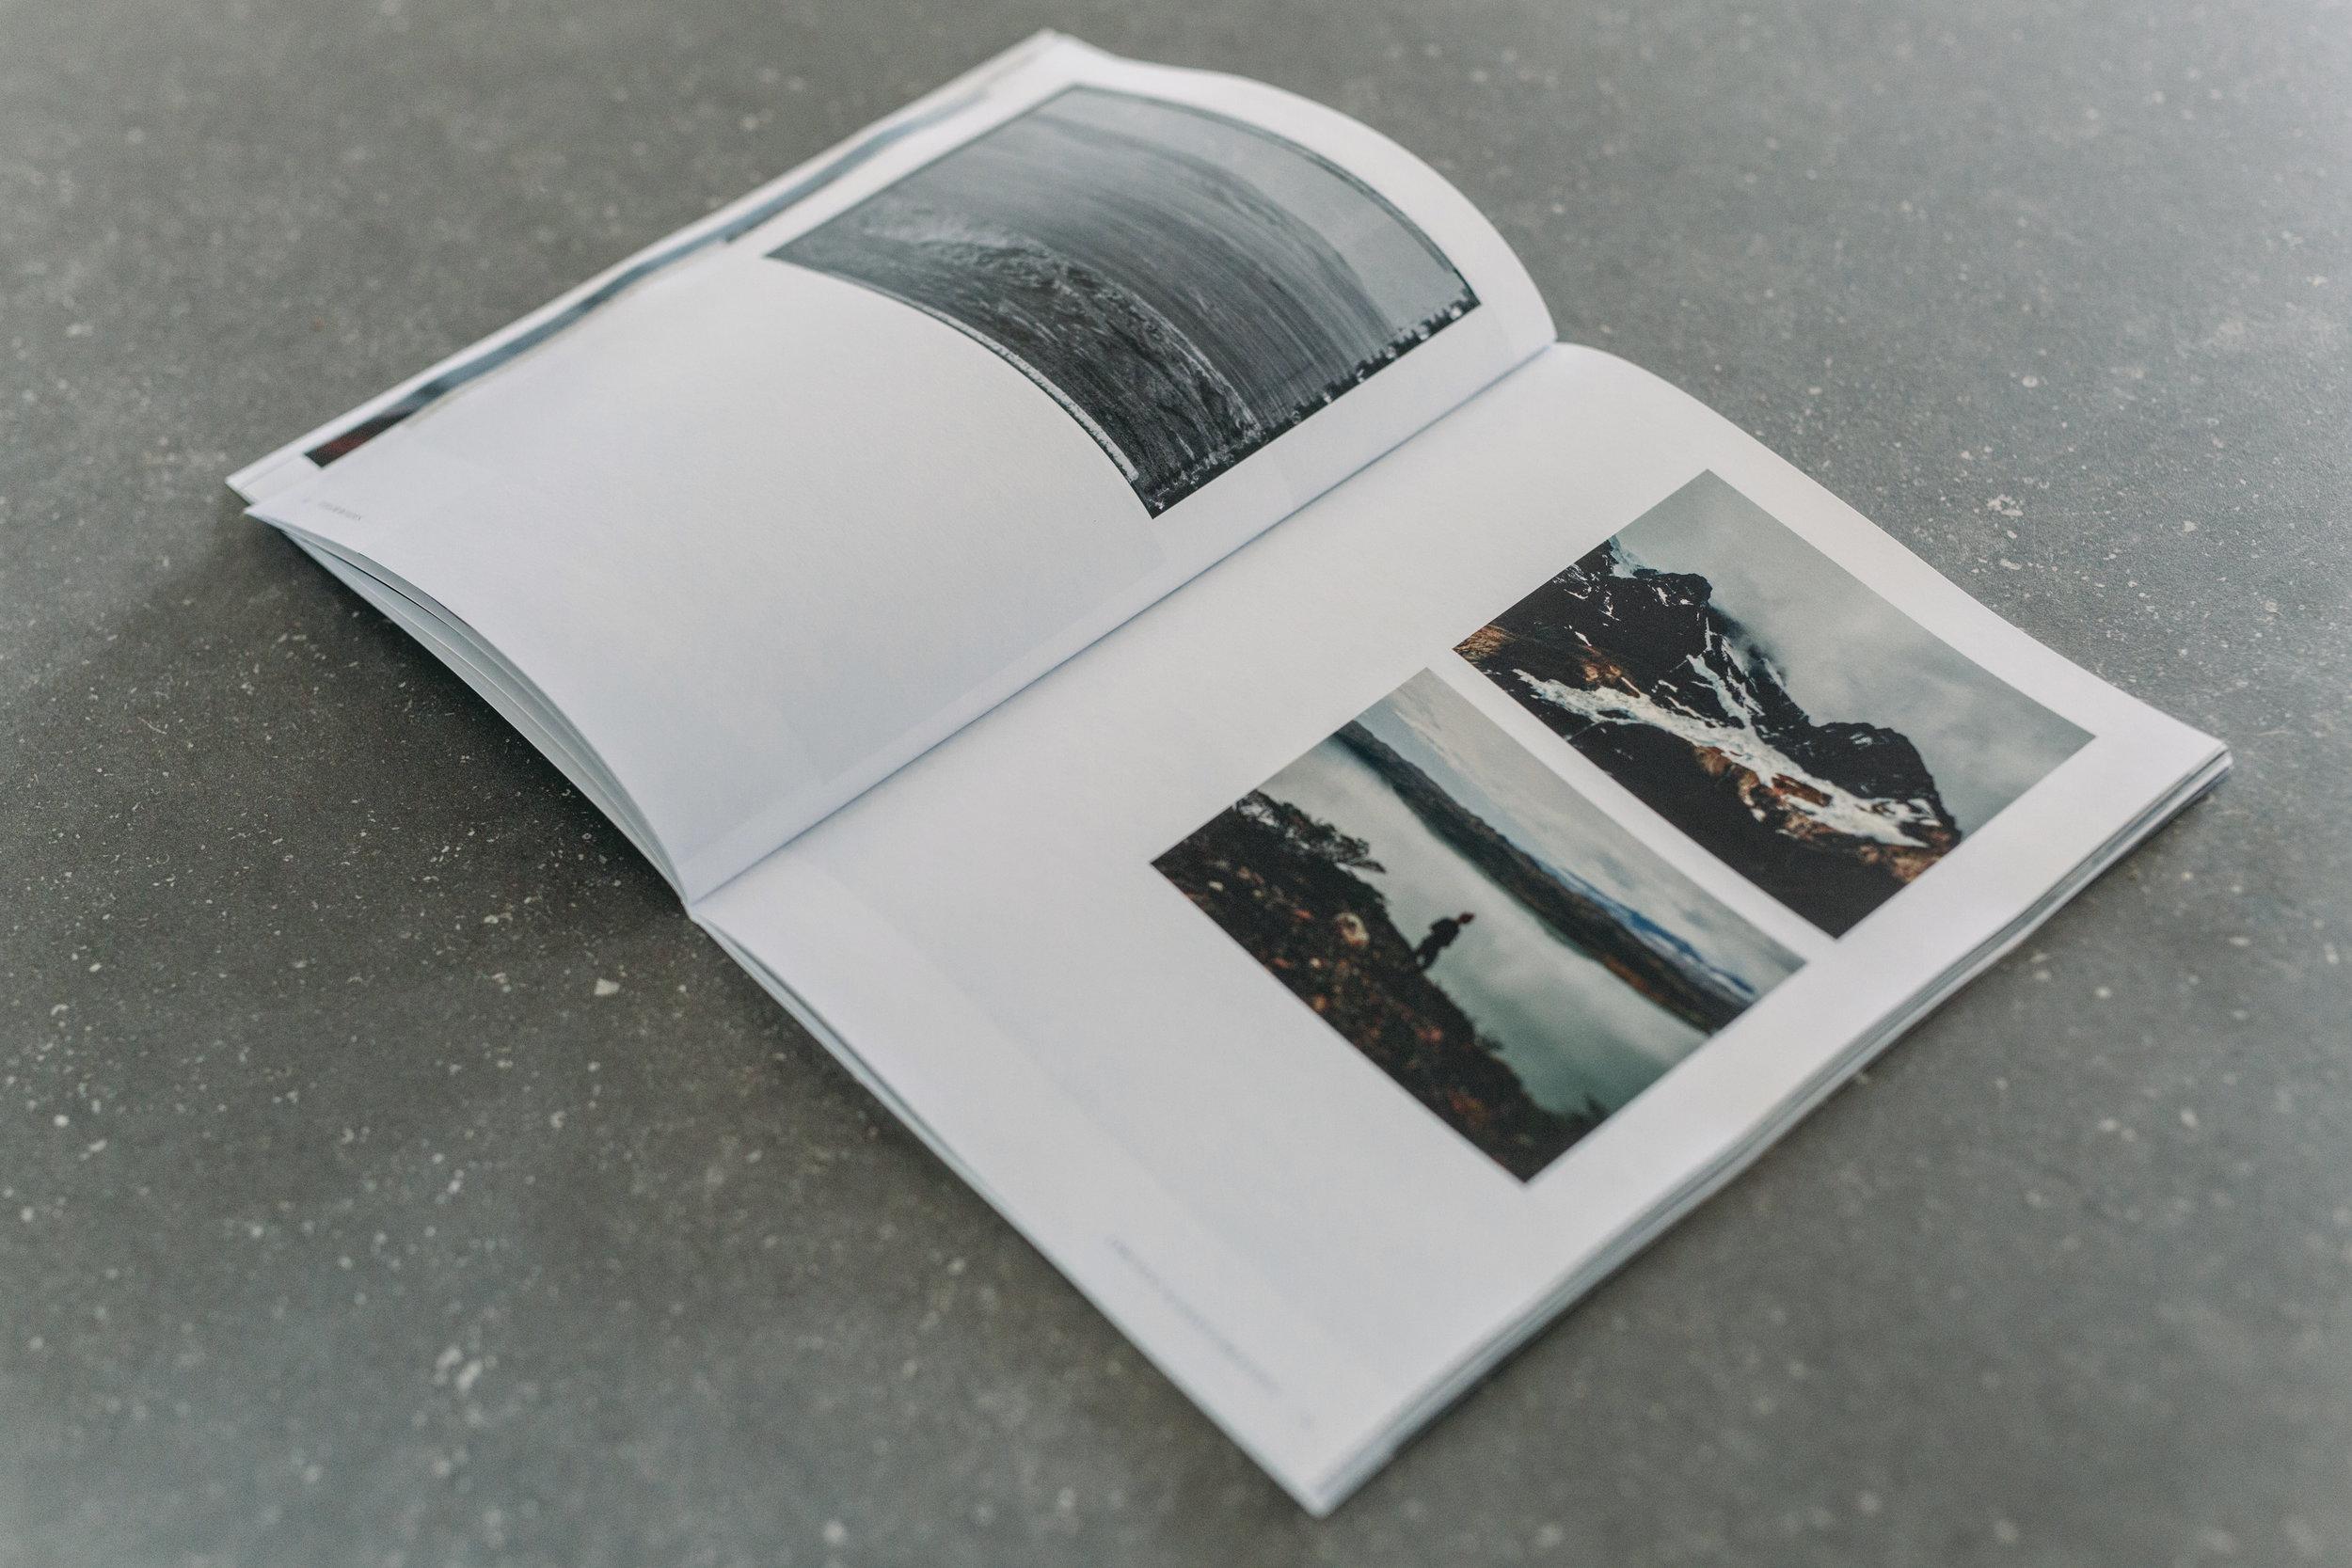 Promo-Books-Photos-TaylorRoades-0036.JPG